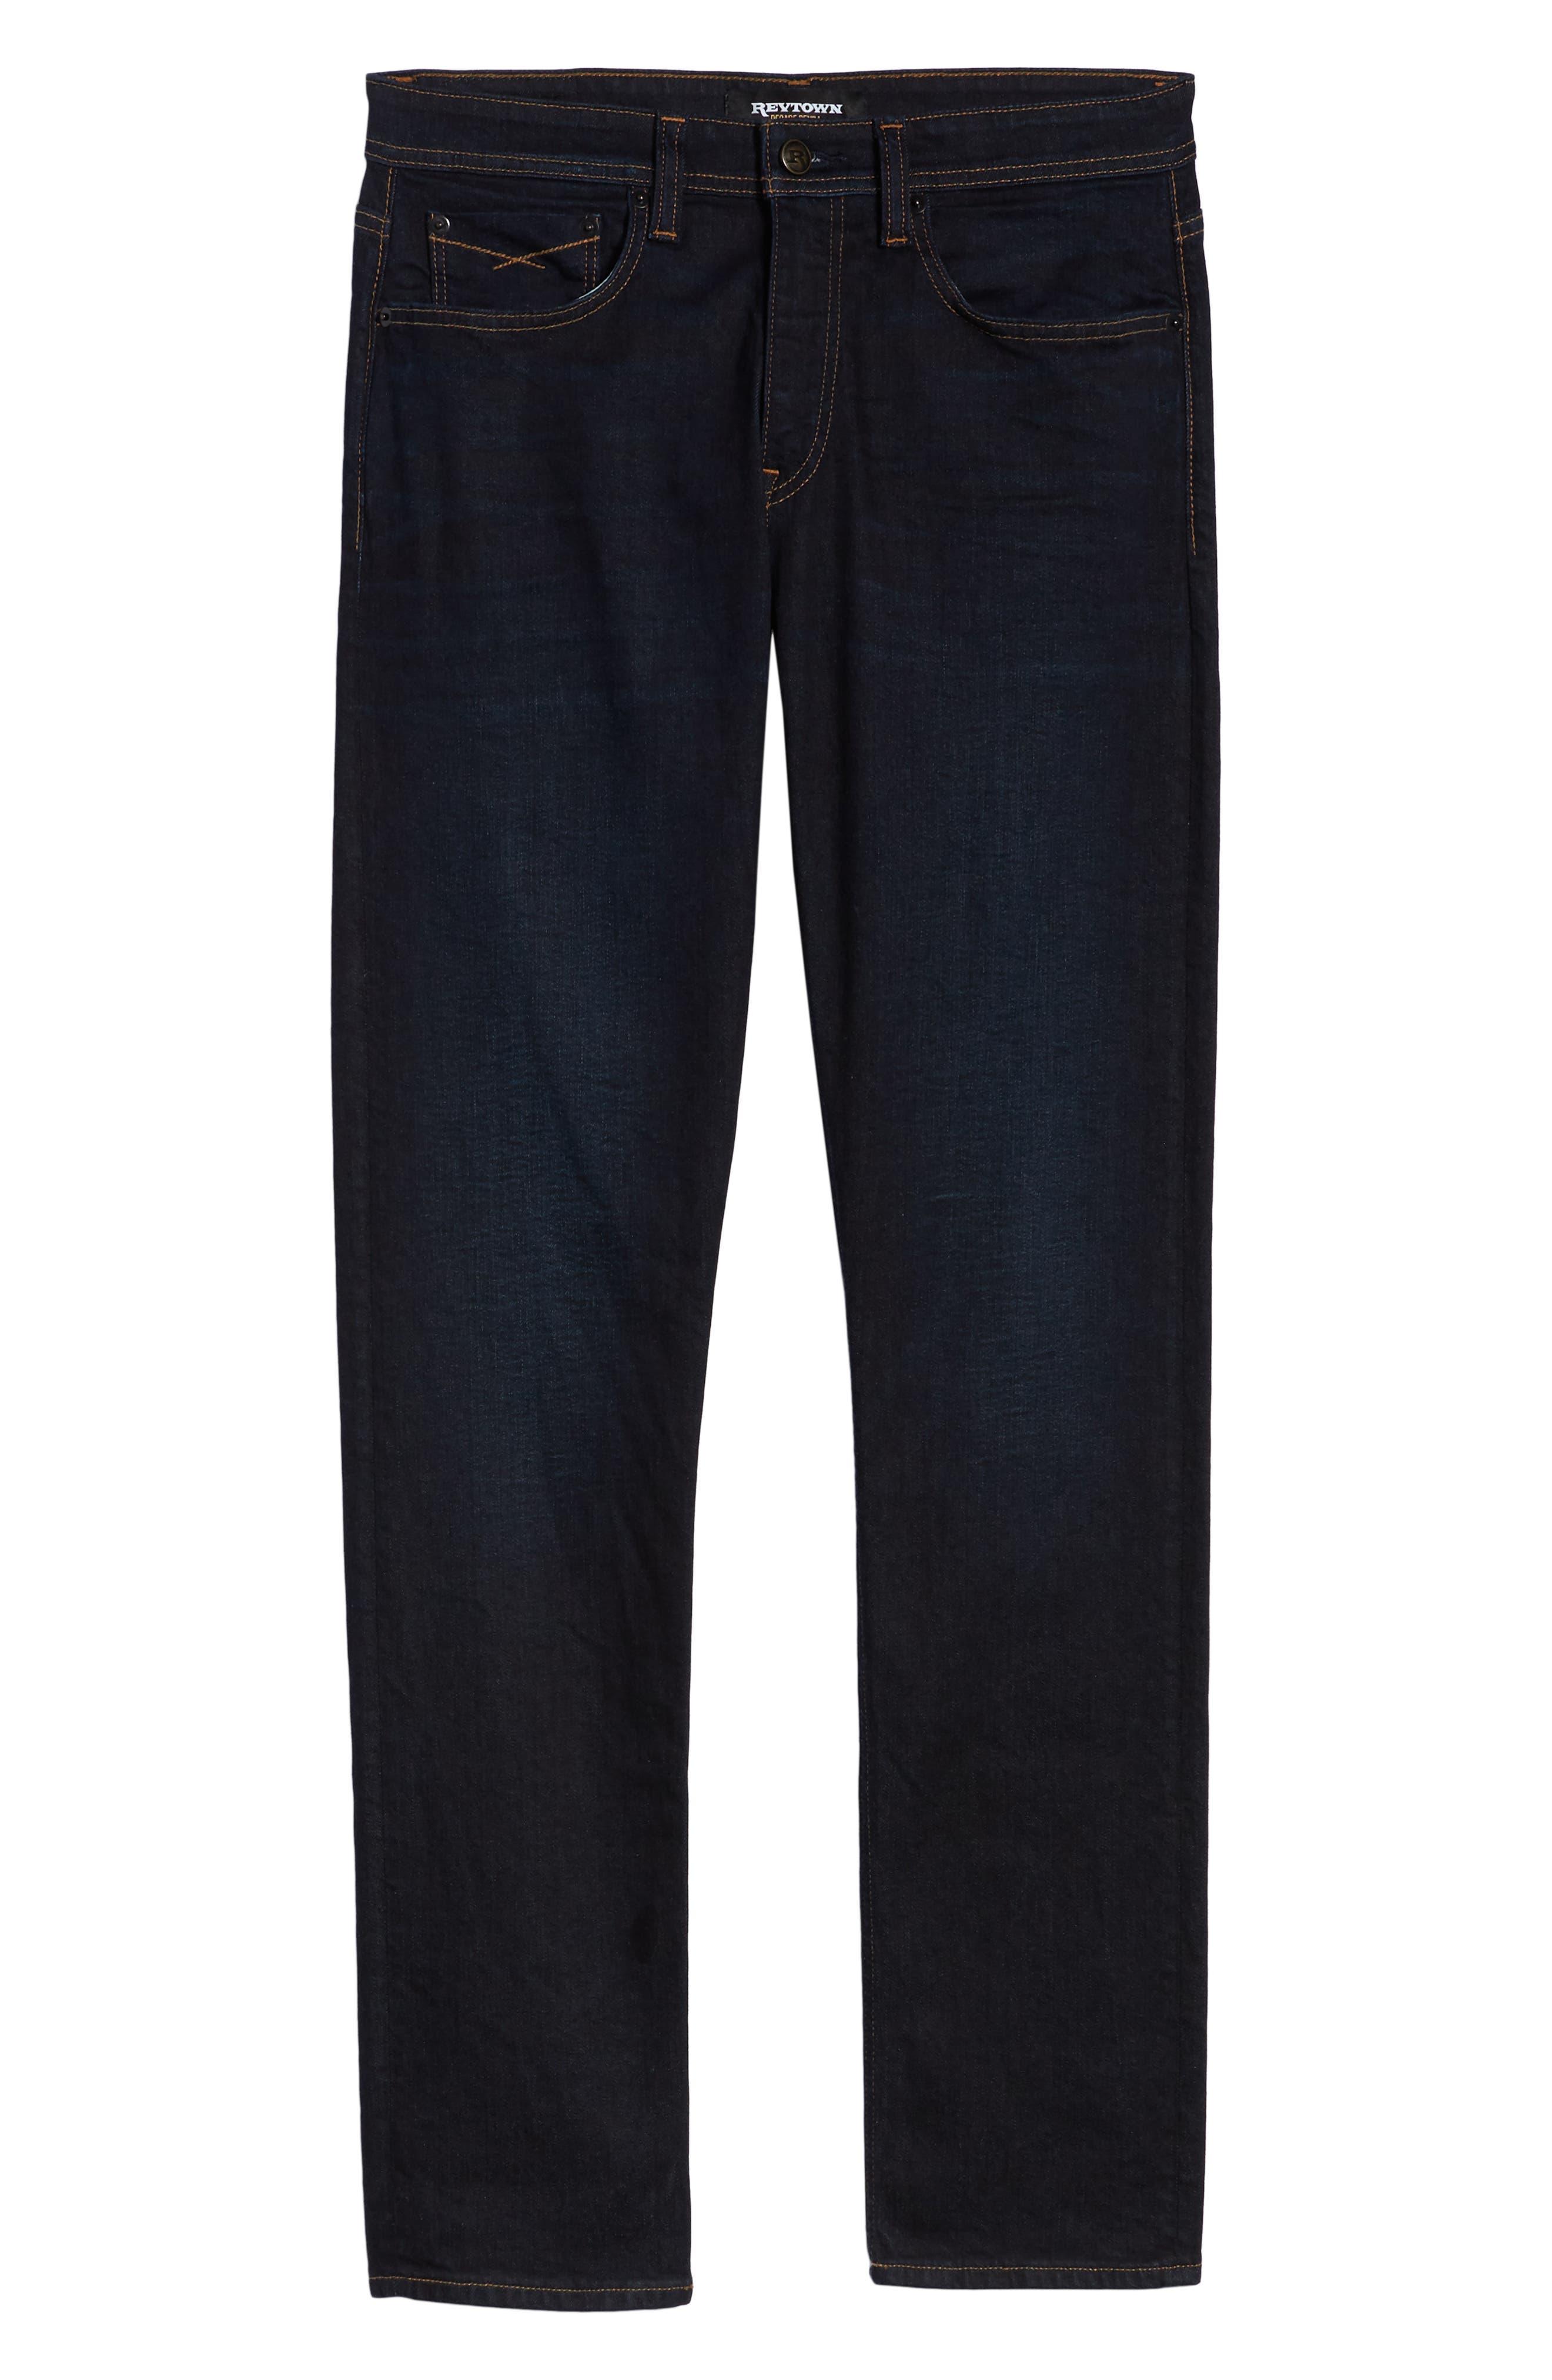 Sharp Slim Fit Jeans,                             Alternate thumbnail 6, color,                             DARK INDIGO